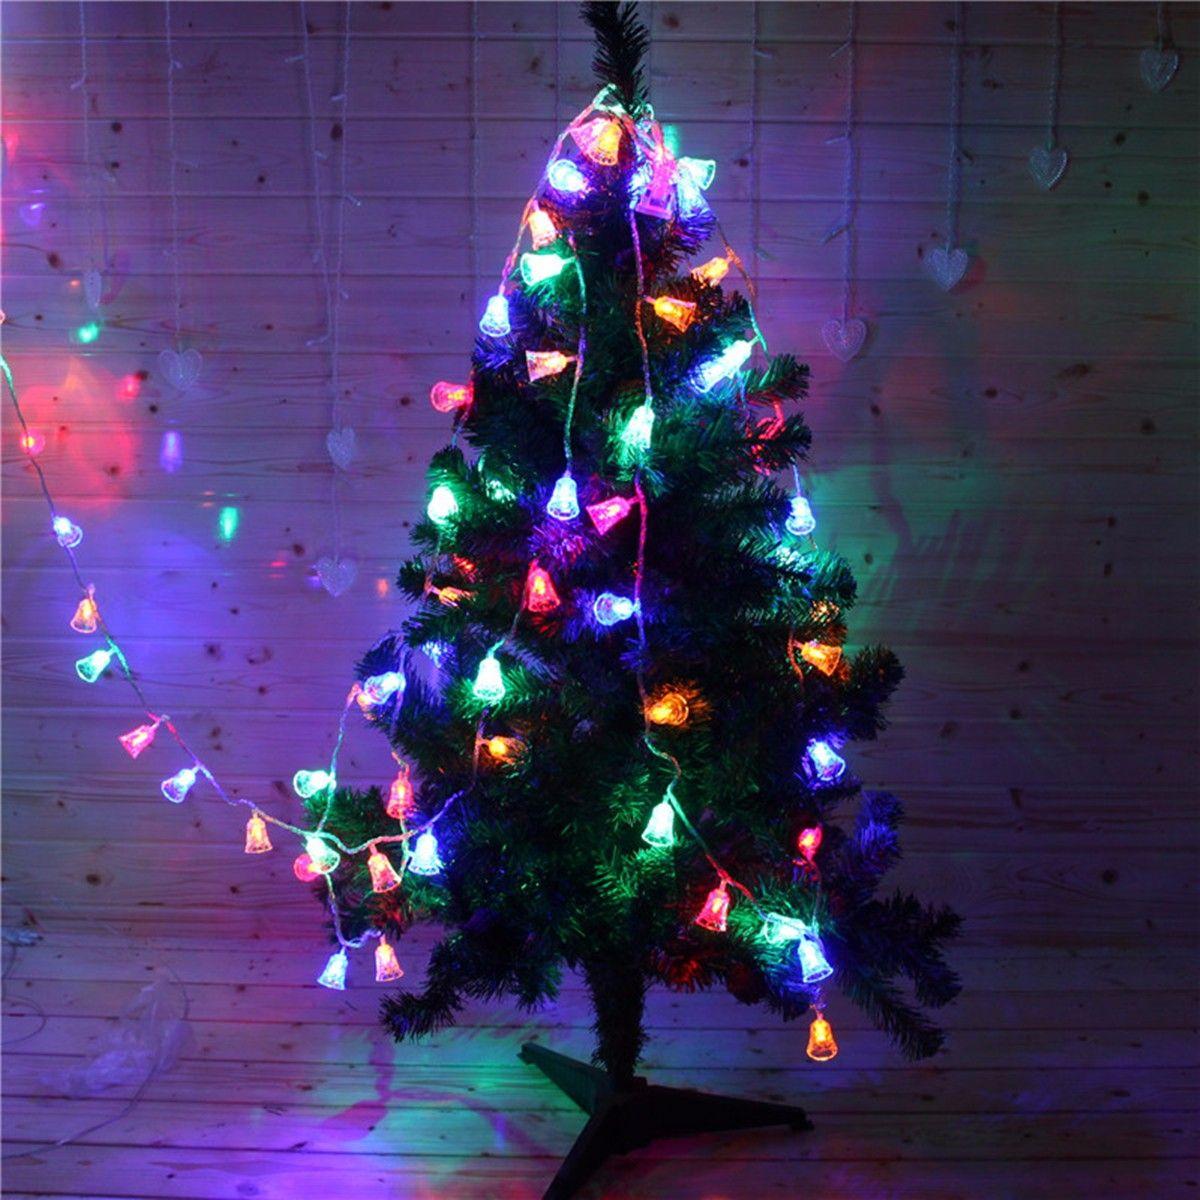 4m 20 LED 작은 벨 문자열 요정 조명 홈 야외 웨딩 갈 랜드 장식 Navidad에 대 한 크리스마스 트리 장식